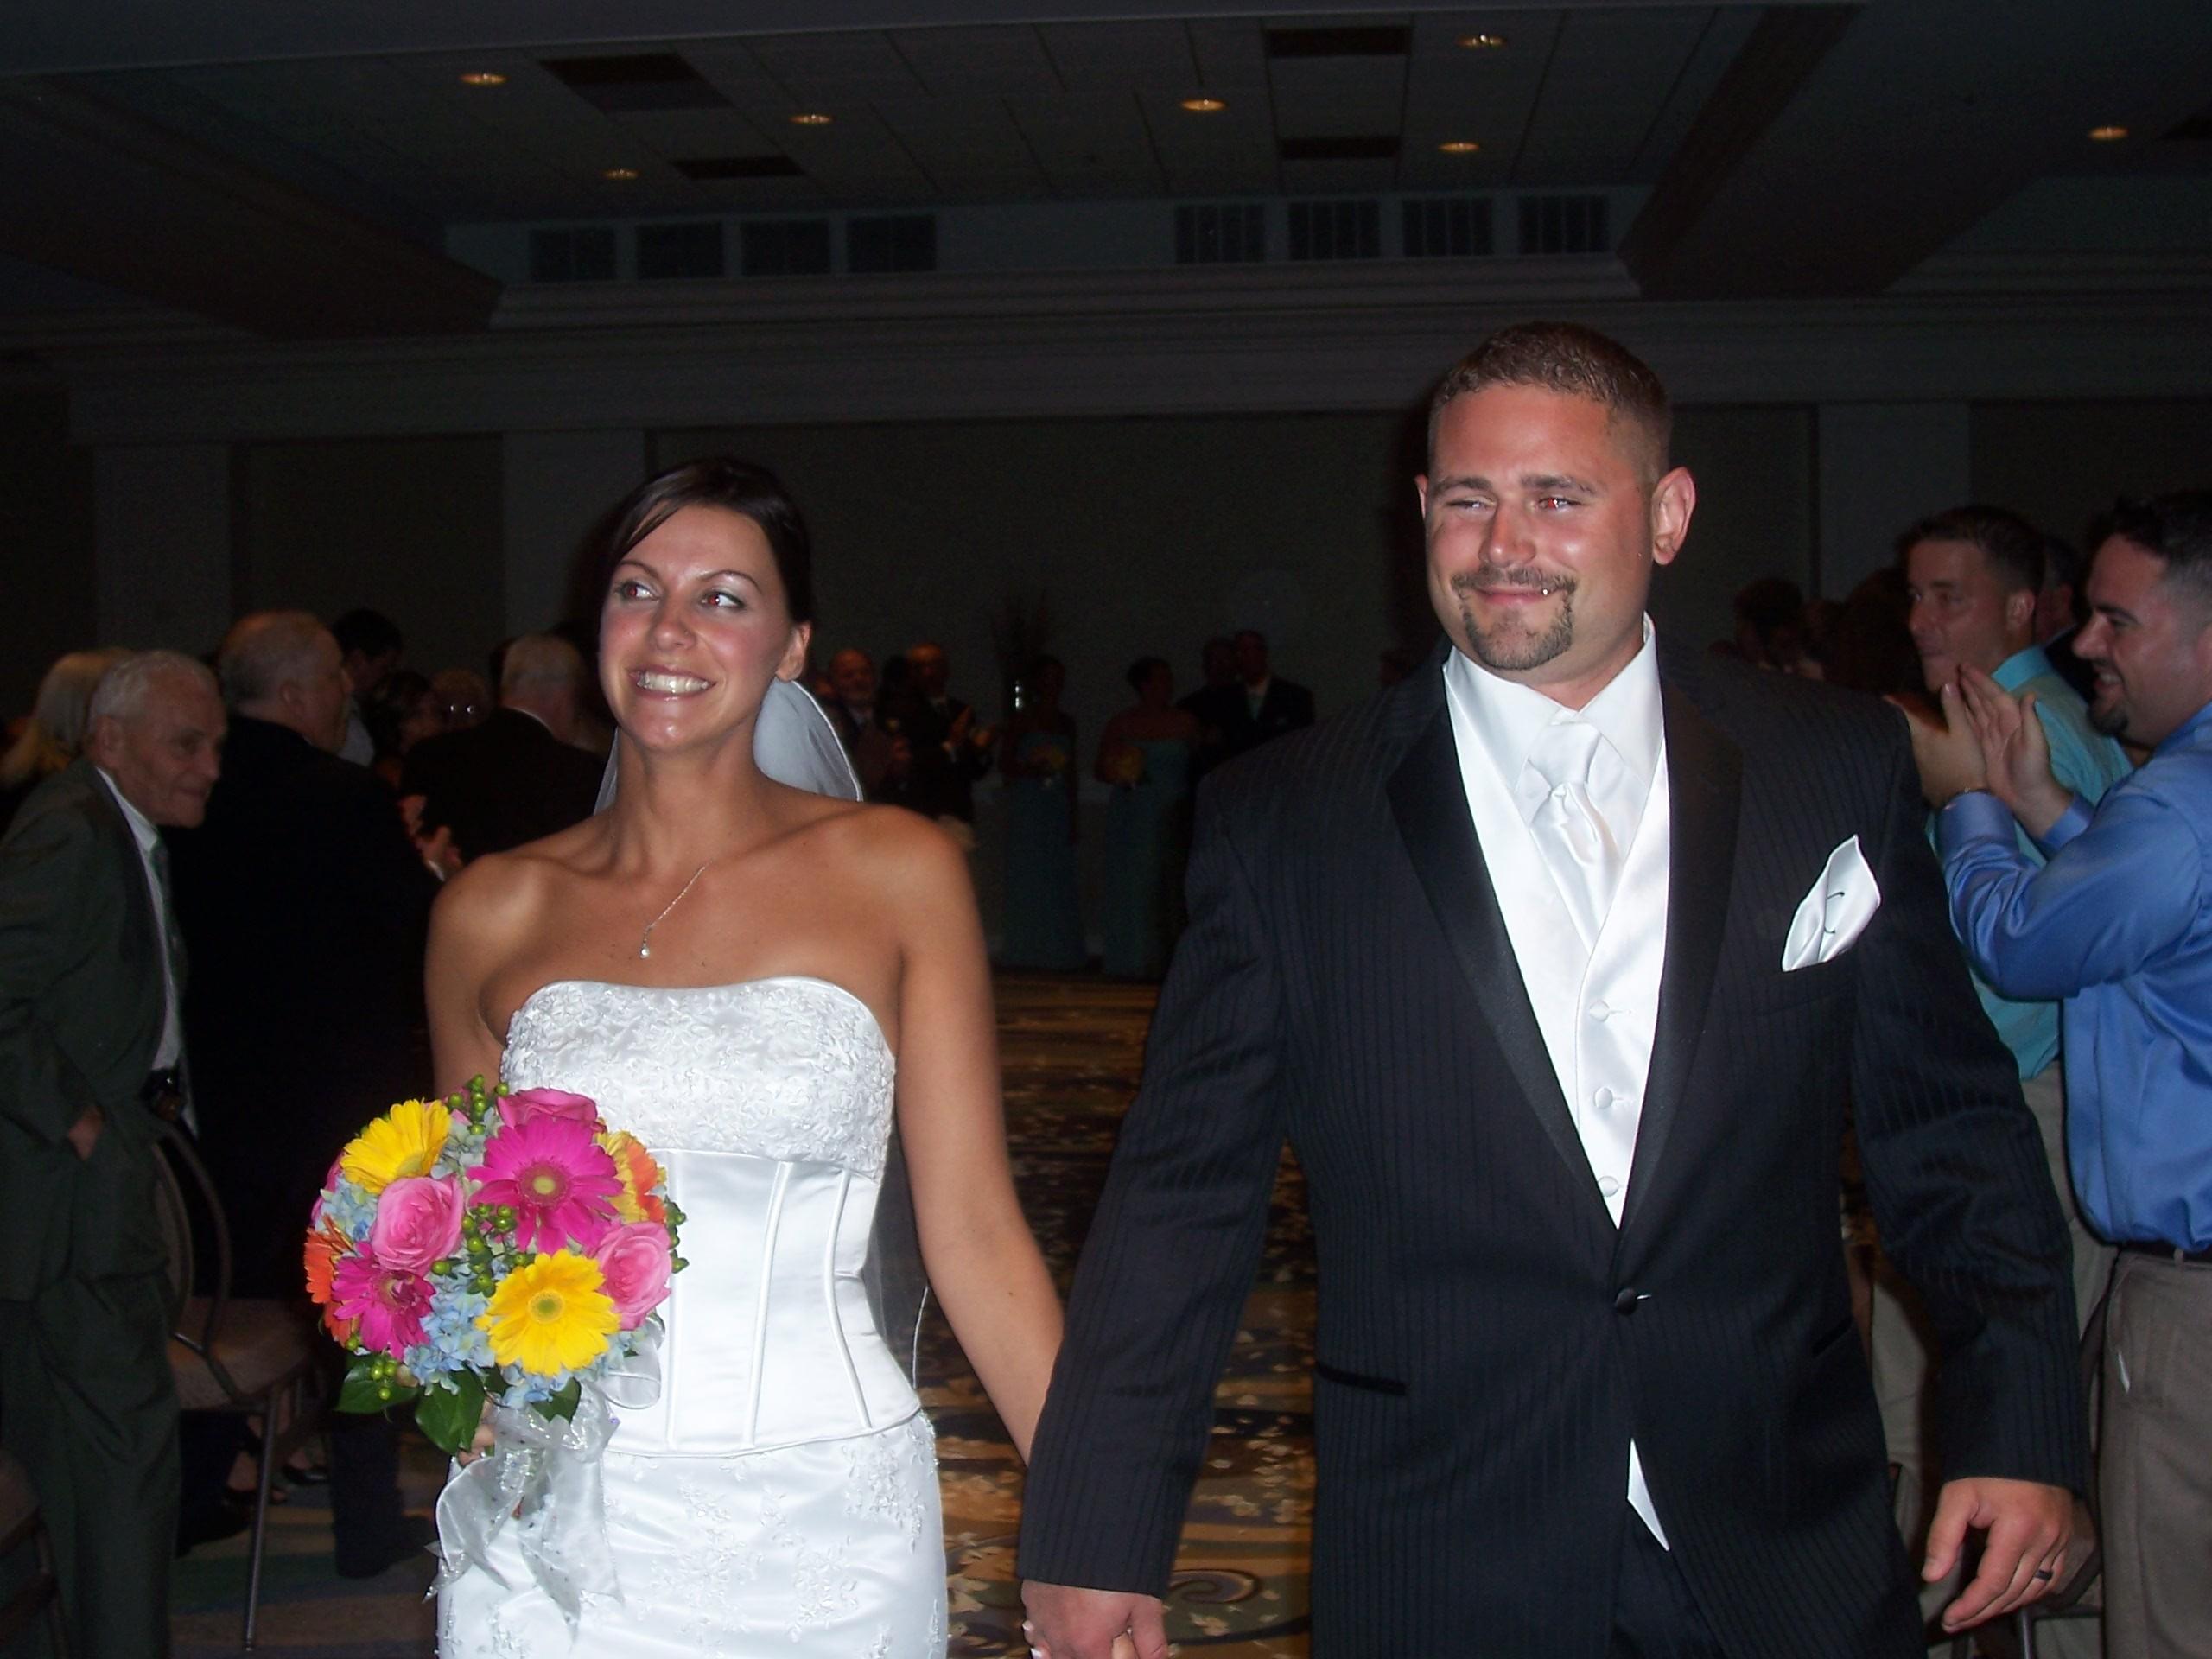 Wedding Dresses, Fashion, dress, Men's Formal Wear, Bride, Groom, Wedding, Tux, Dj, Ra-mu and the crew